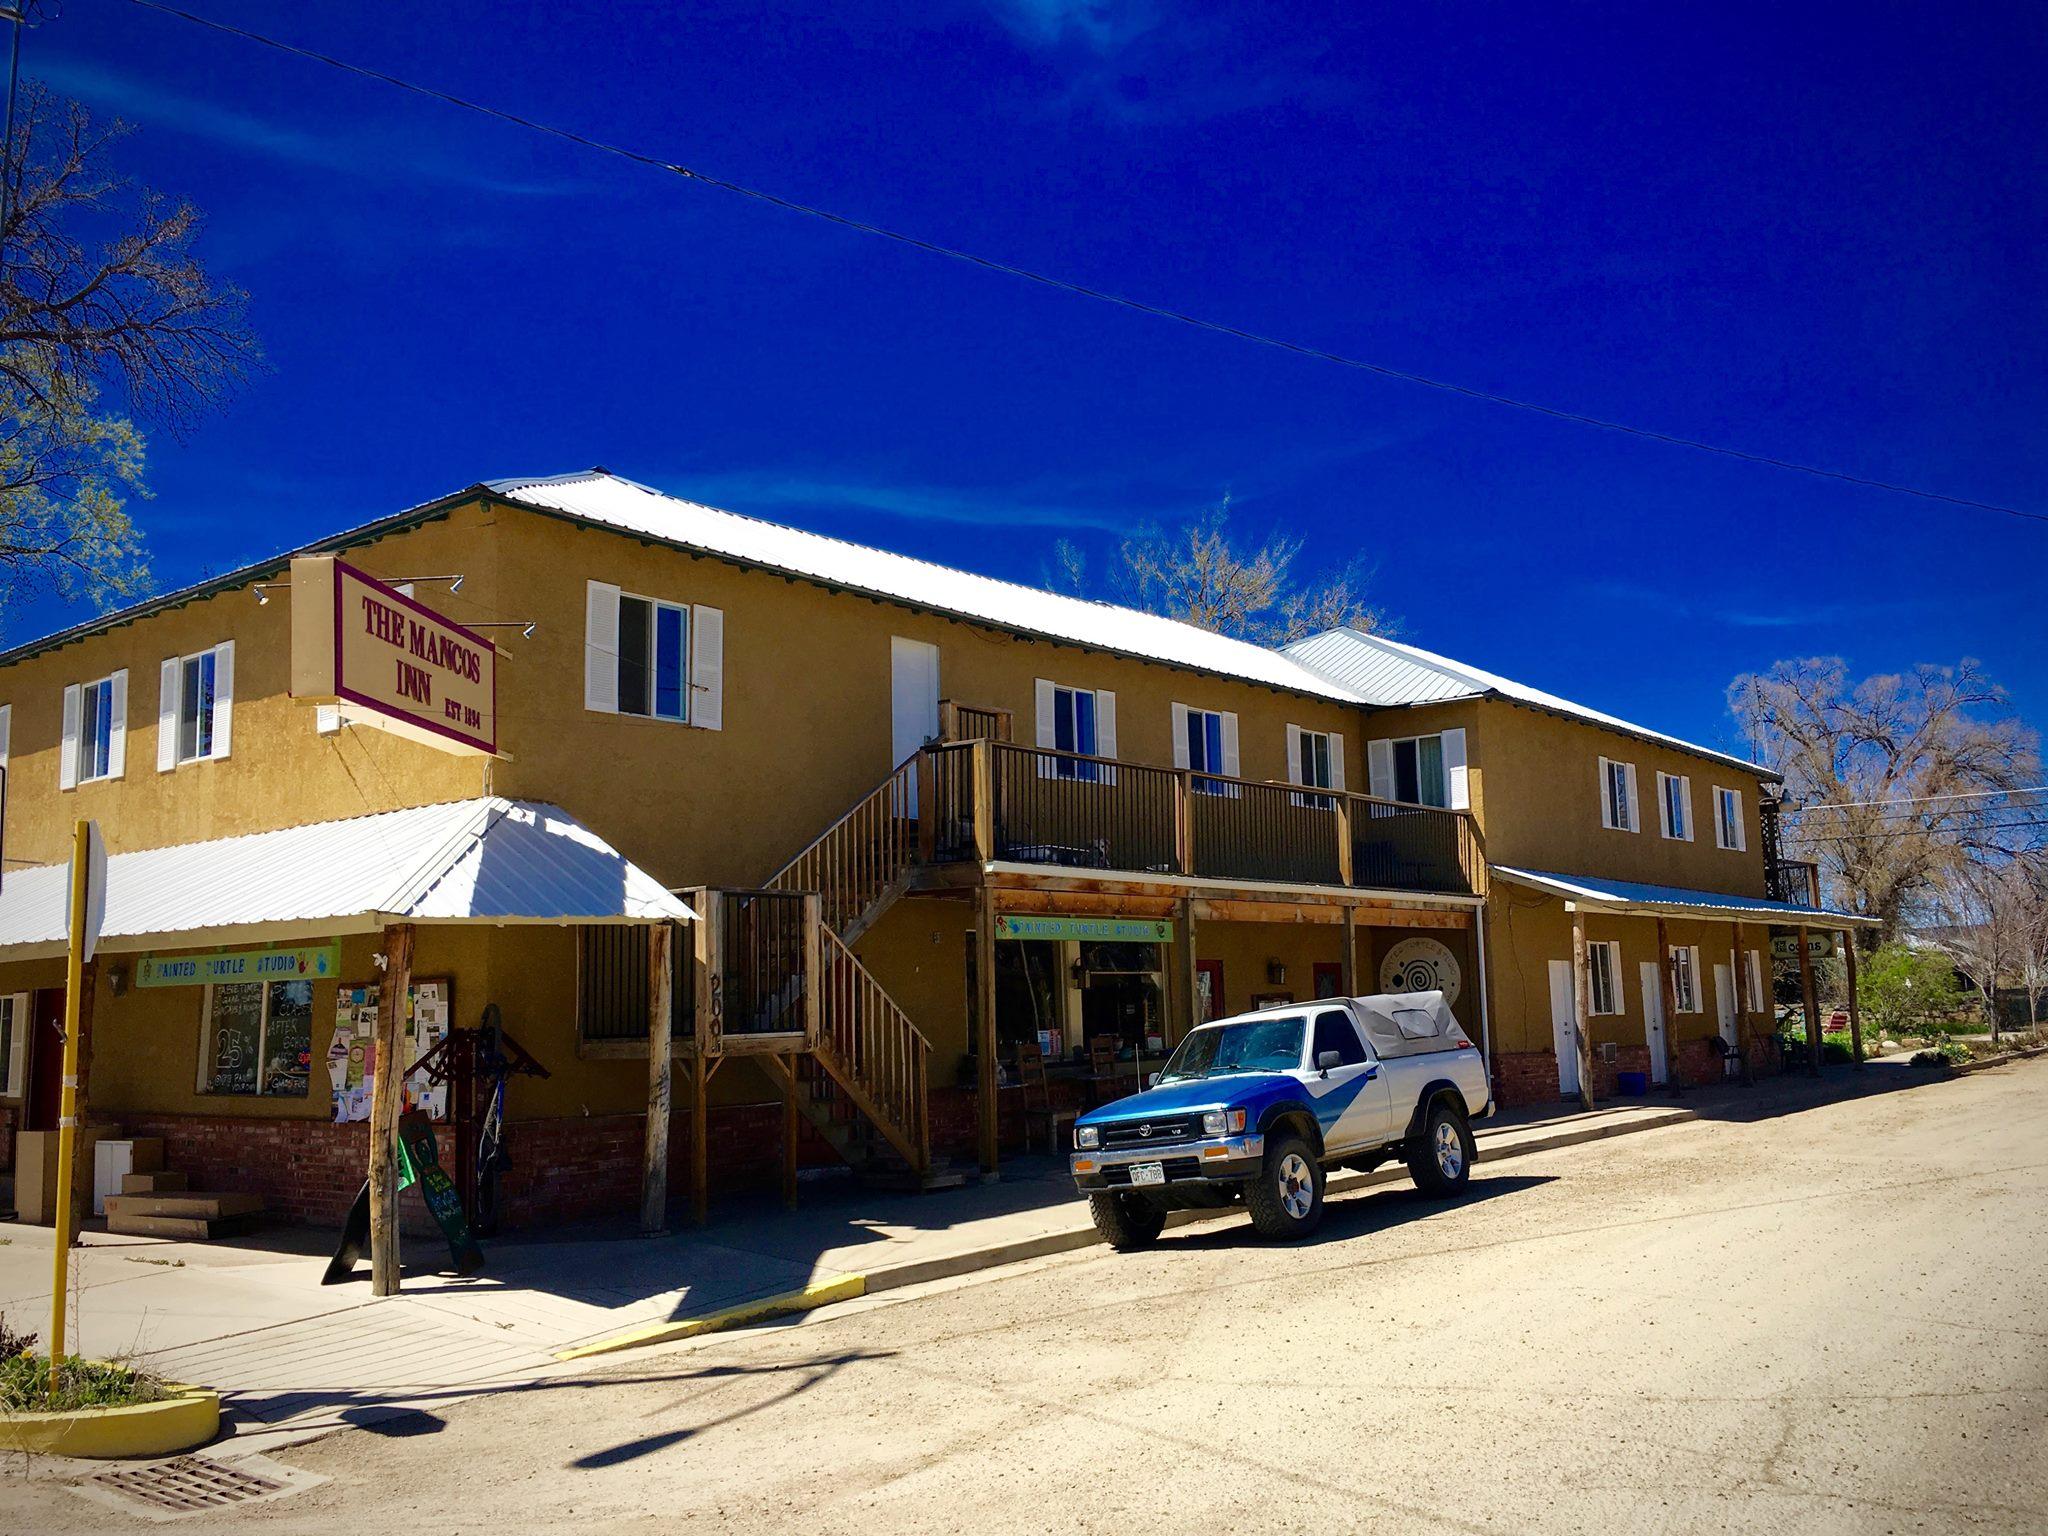 image of mancos inn and hostel